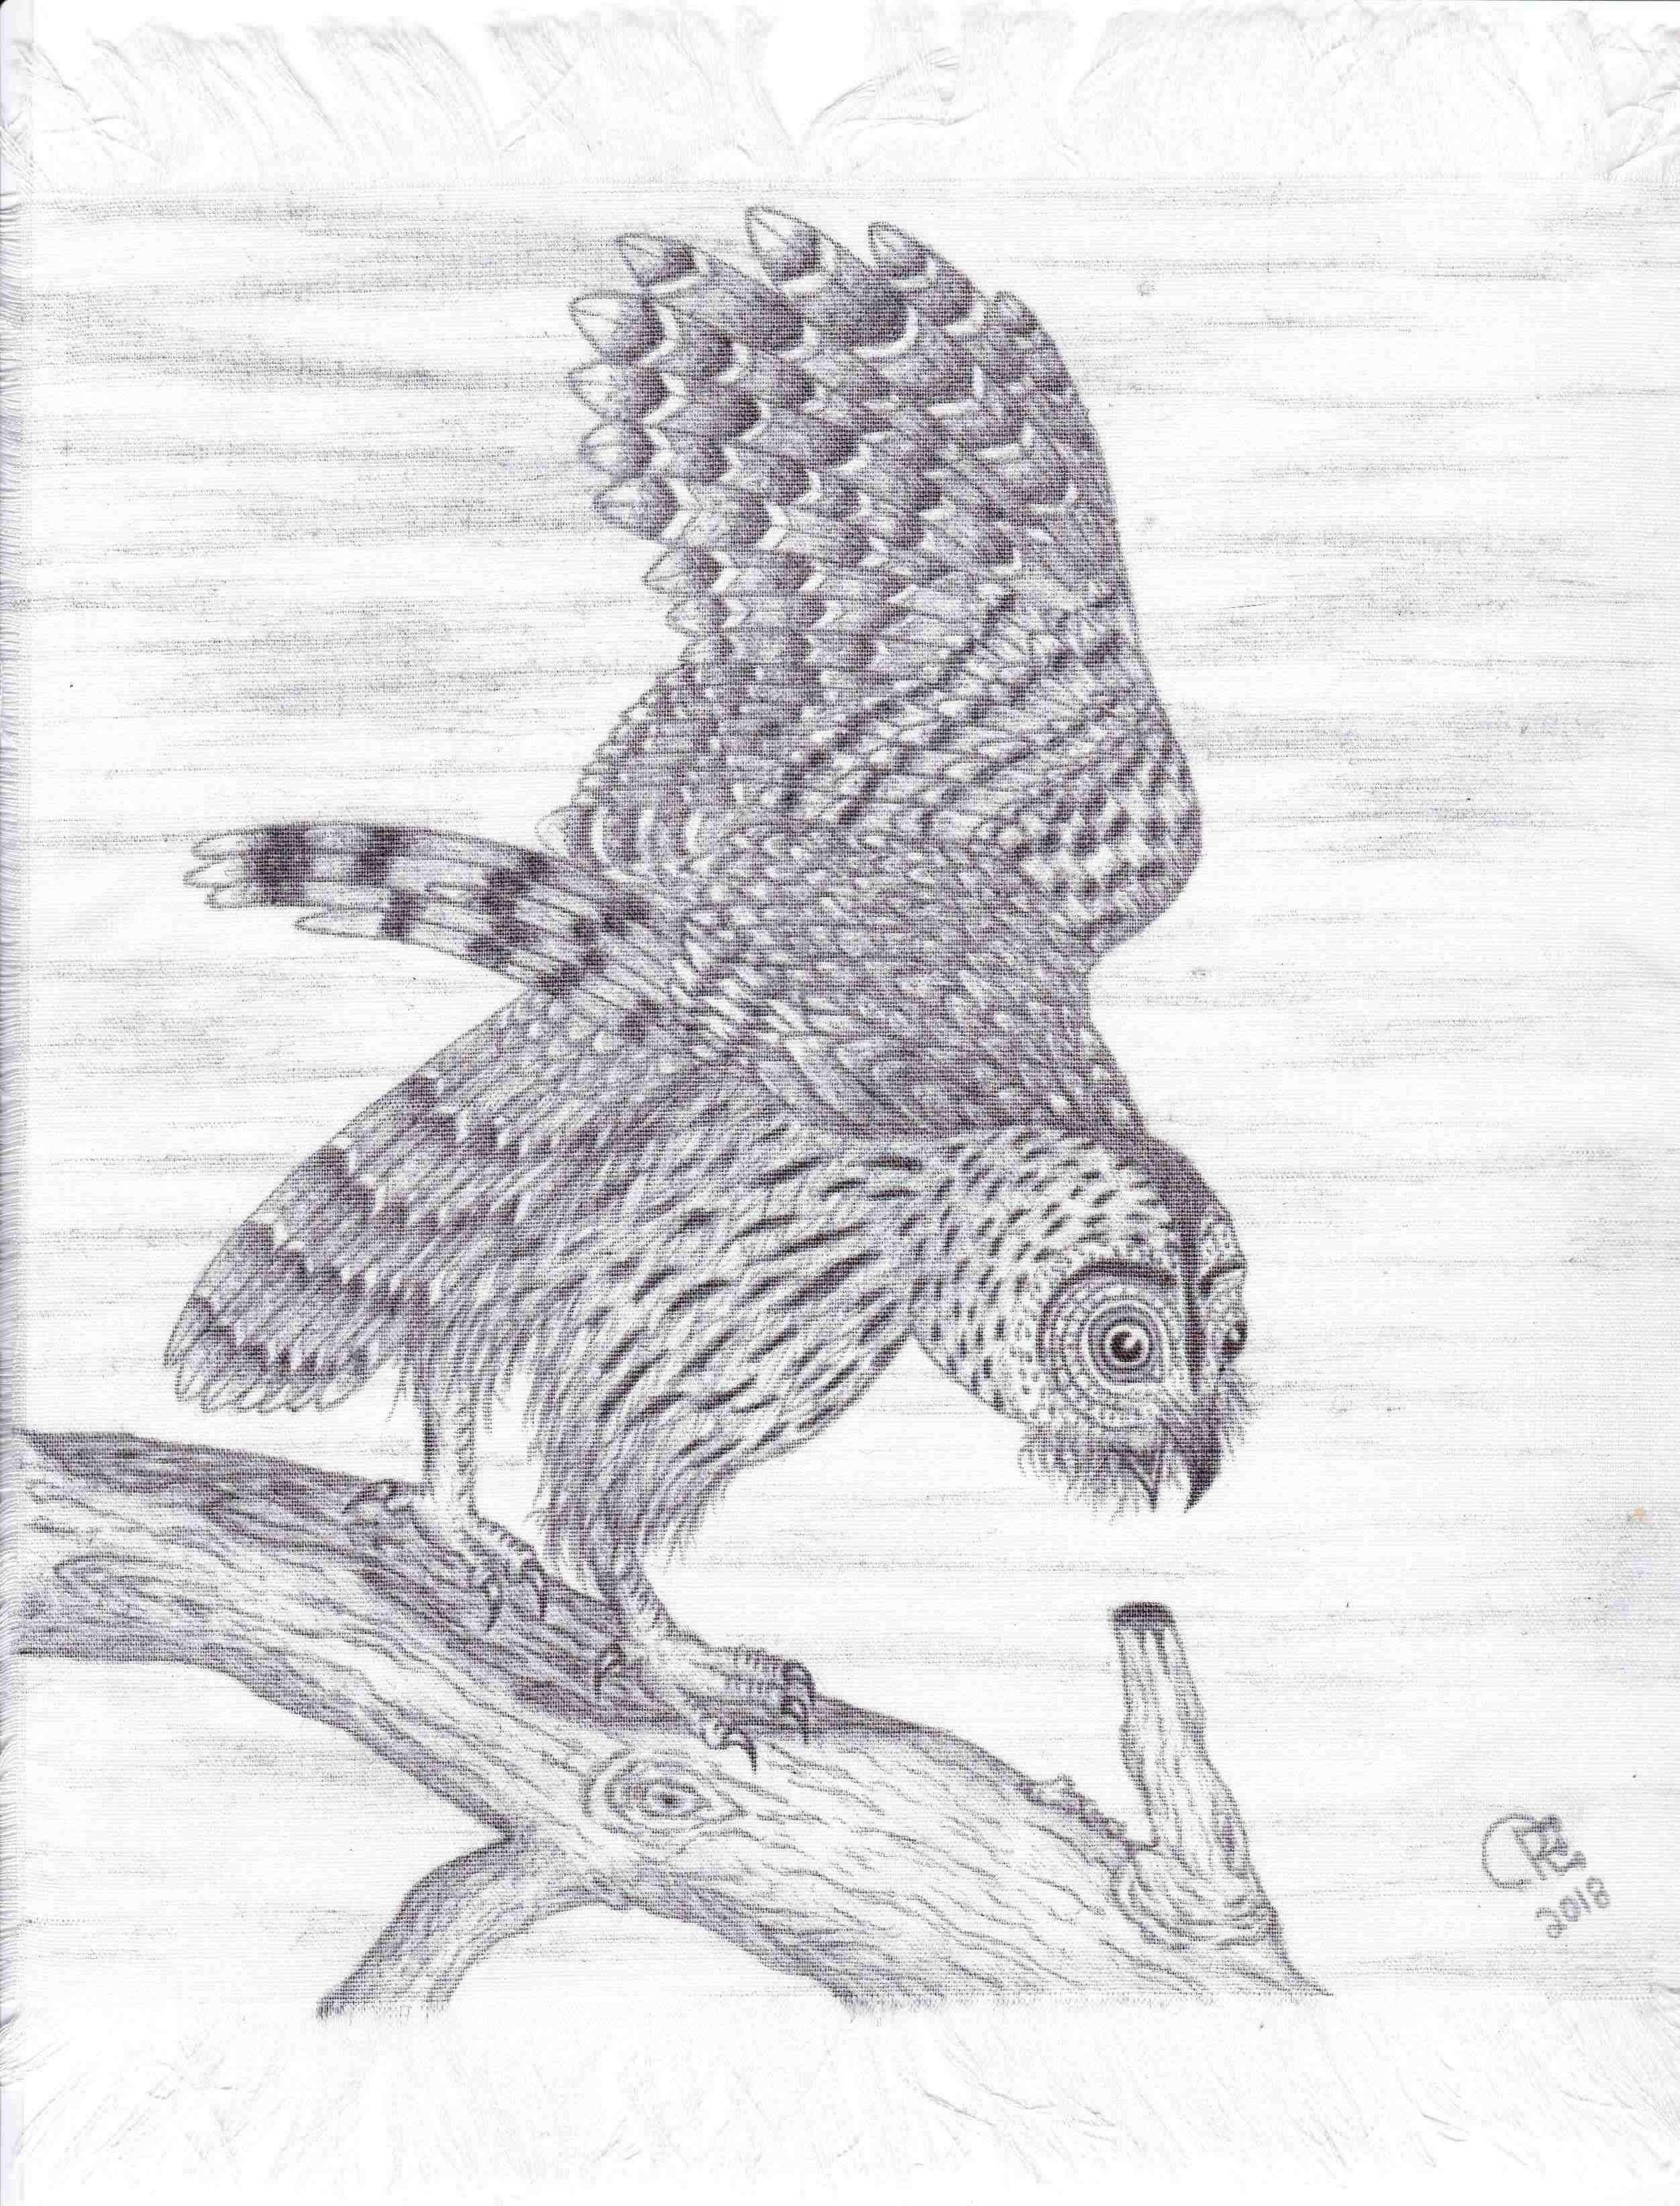 Owl by Roger Florida-Owl by Roger Florida-IMG_20181125_0001.jpg